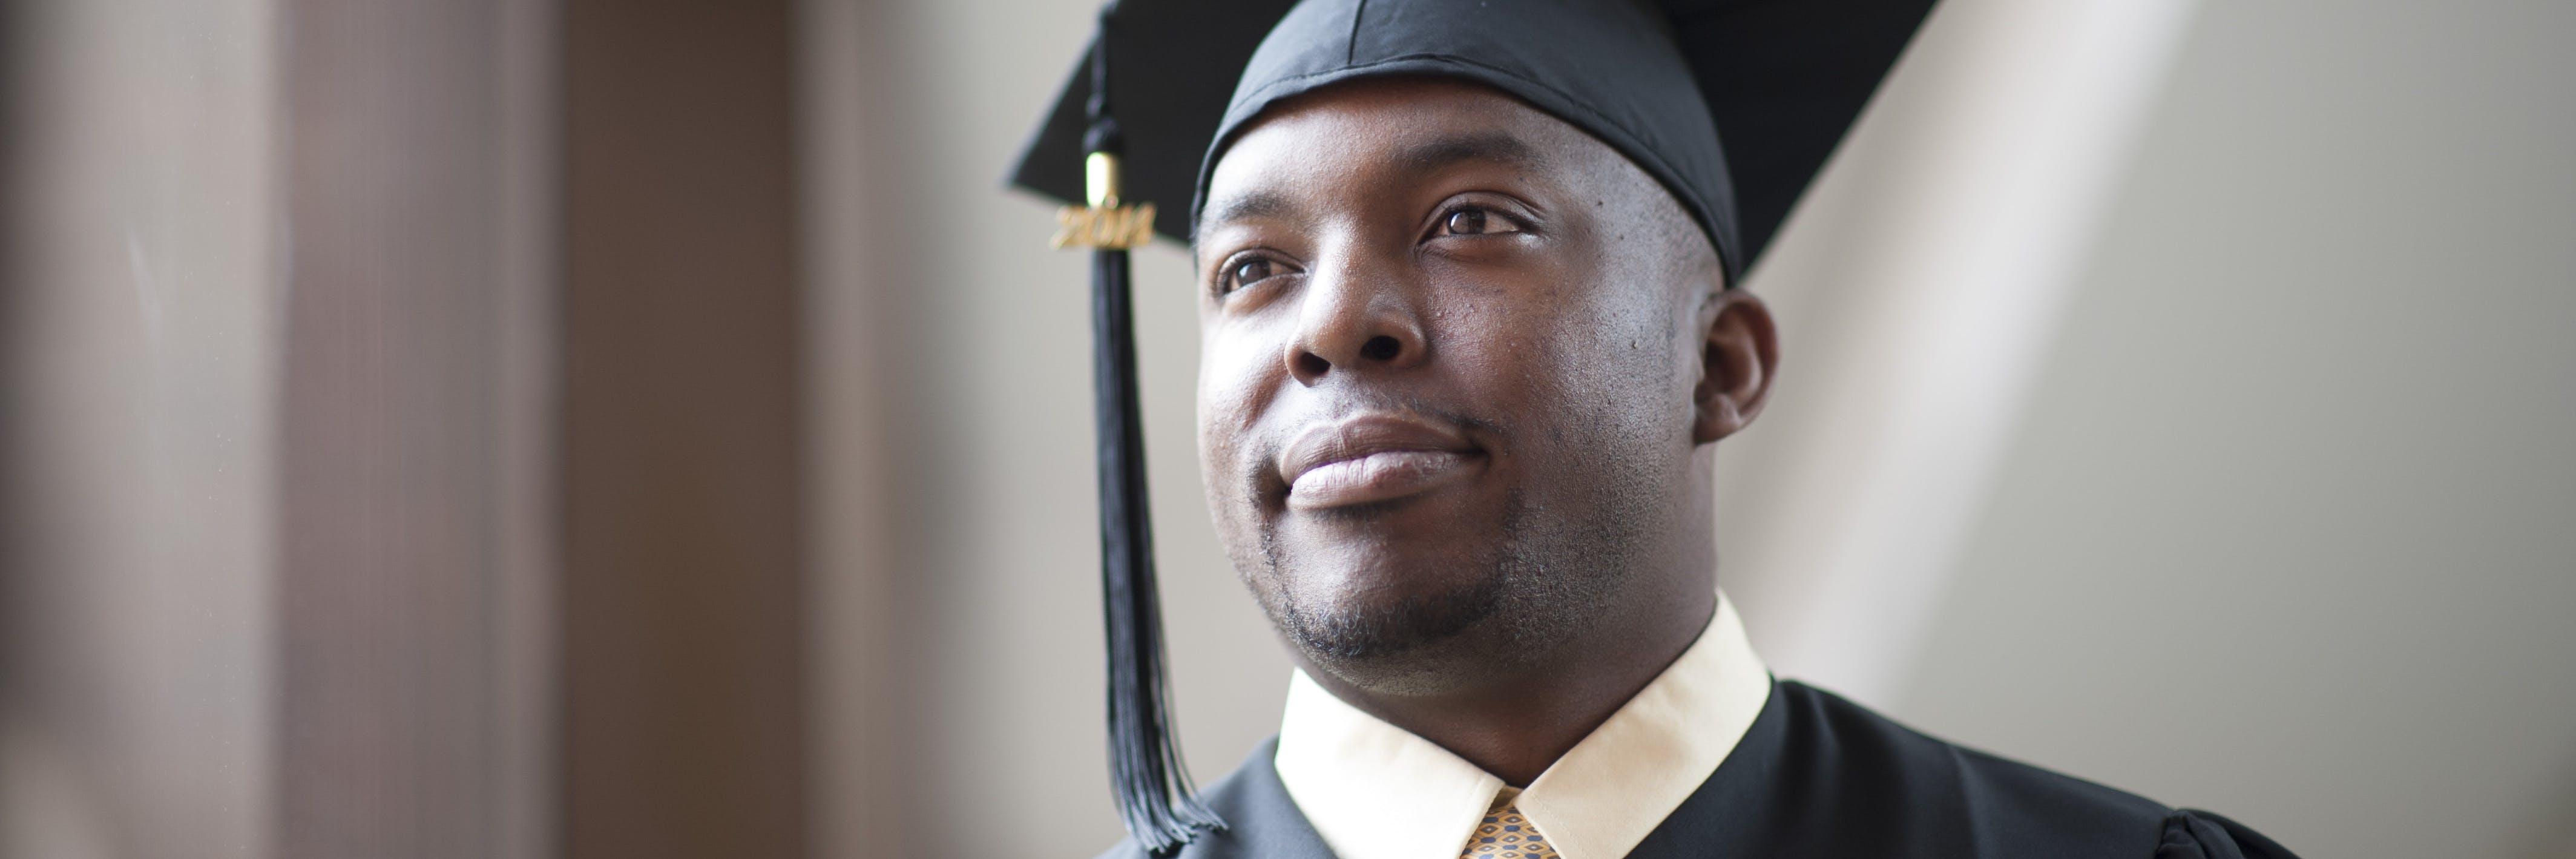 A graduate student smiling